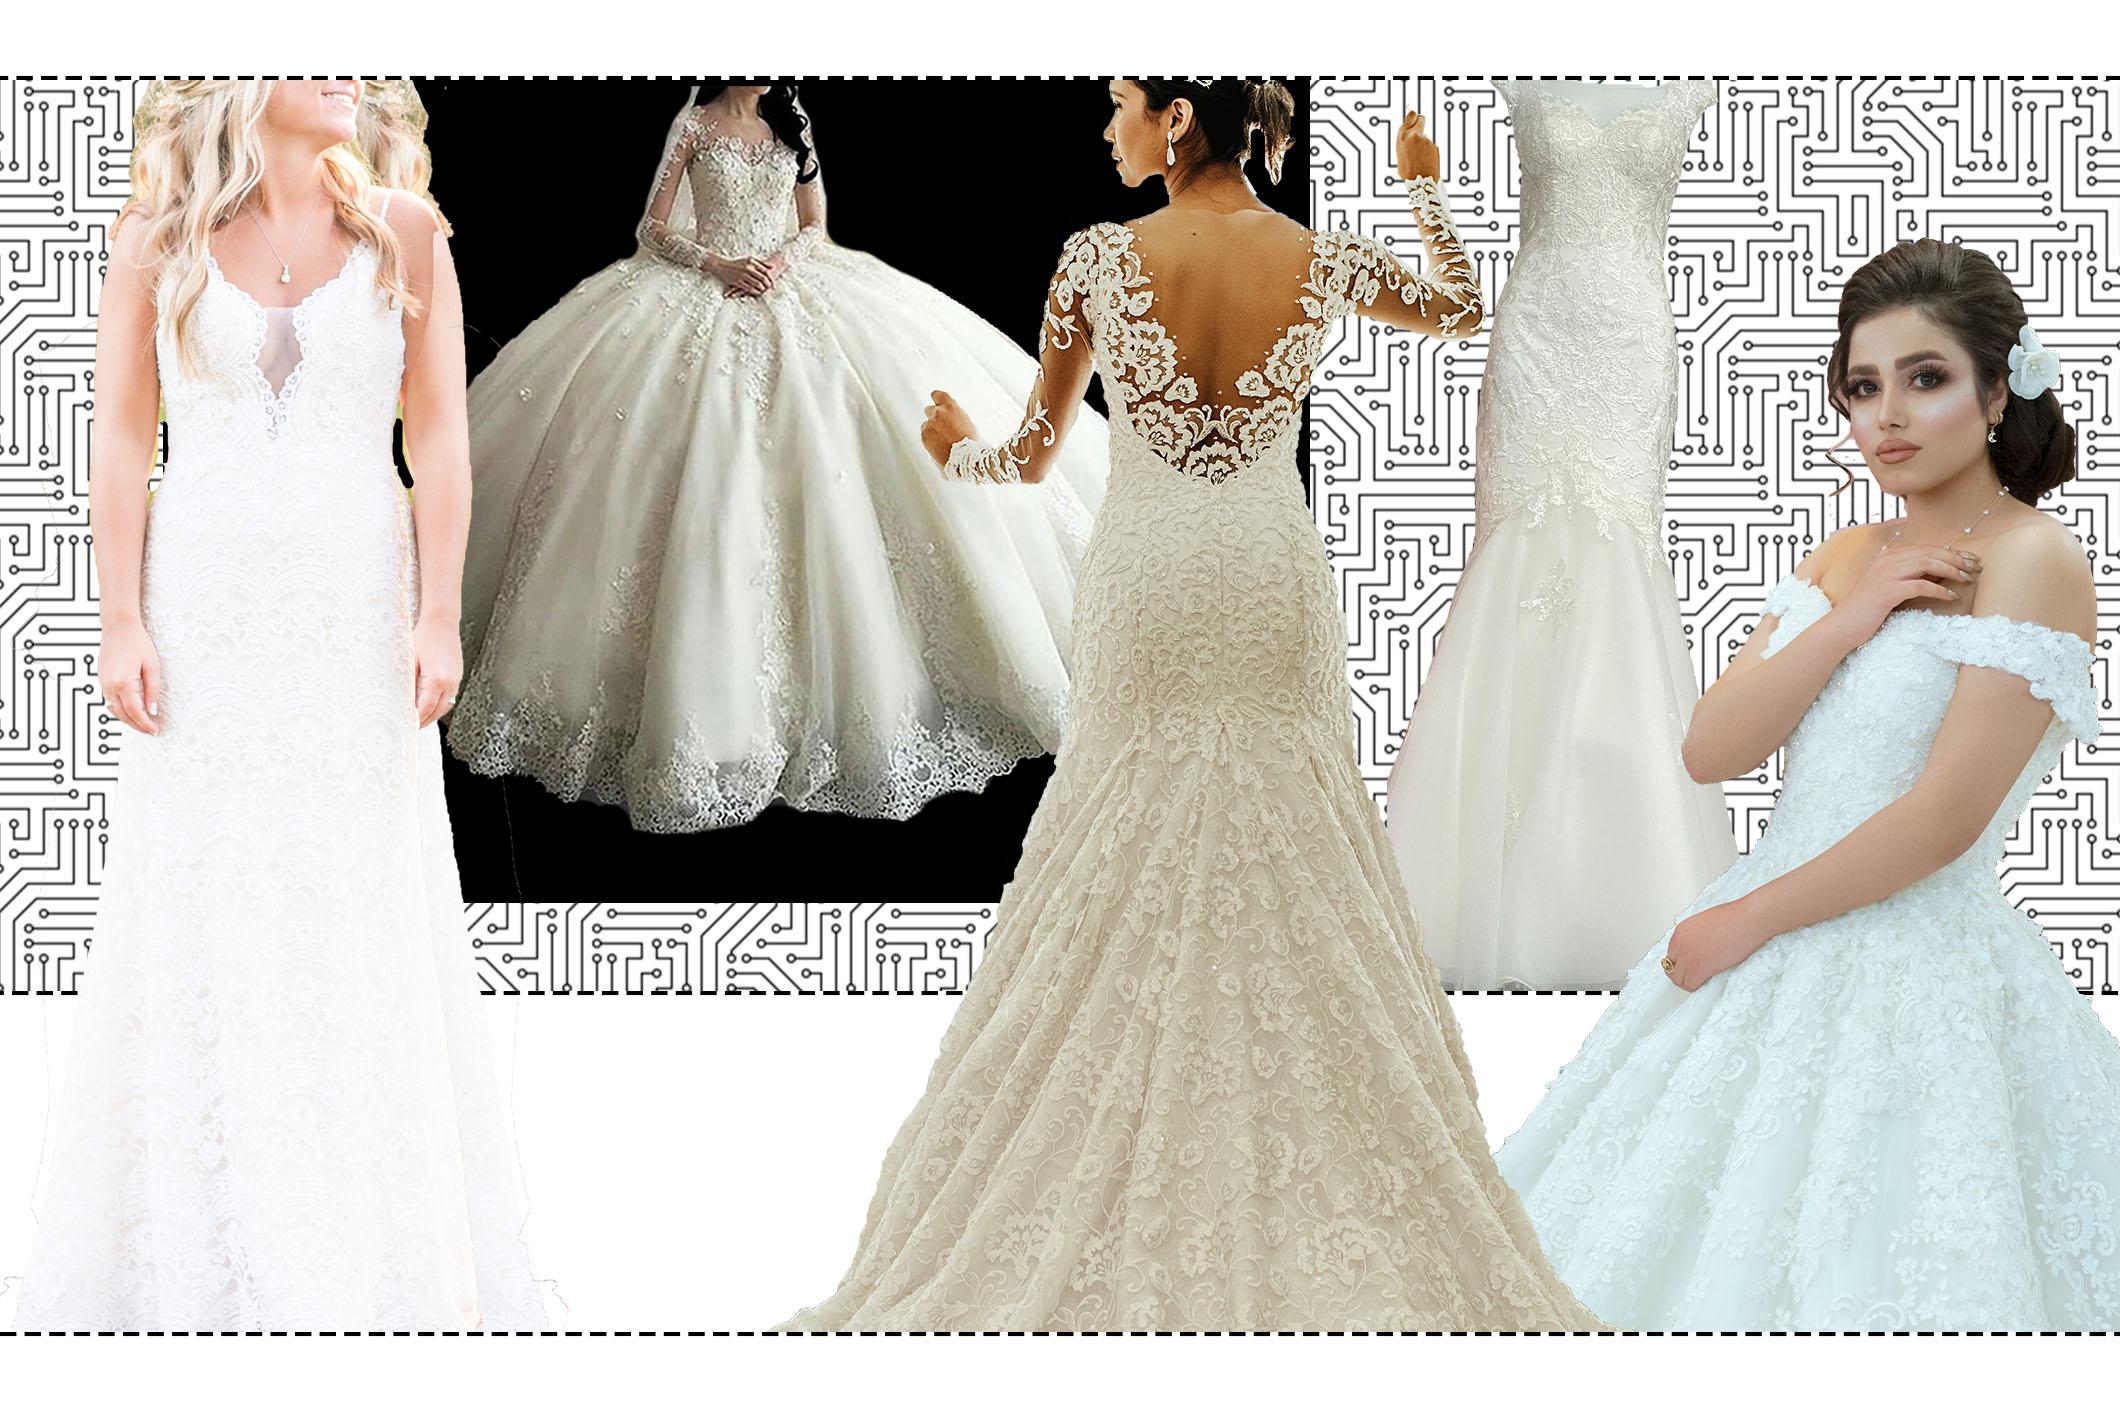 Wedding Dress Blog picjpg